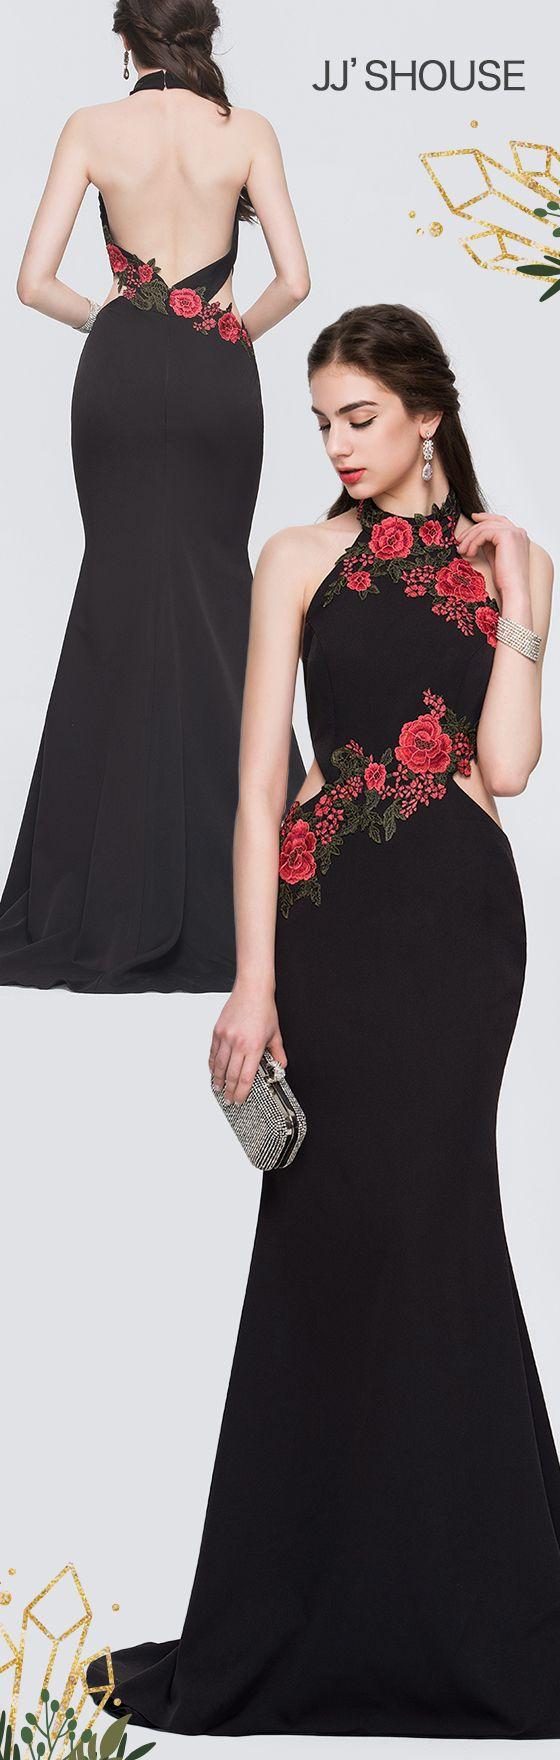 815 Best Blzki Images On Pinterest Beautiful Dresses Evening L 873 Cloudy Kimono Lingerie Jjshouse Promdresses